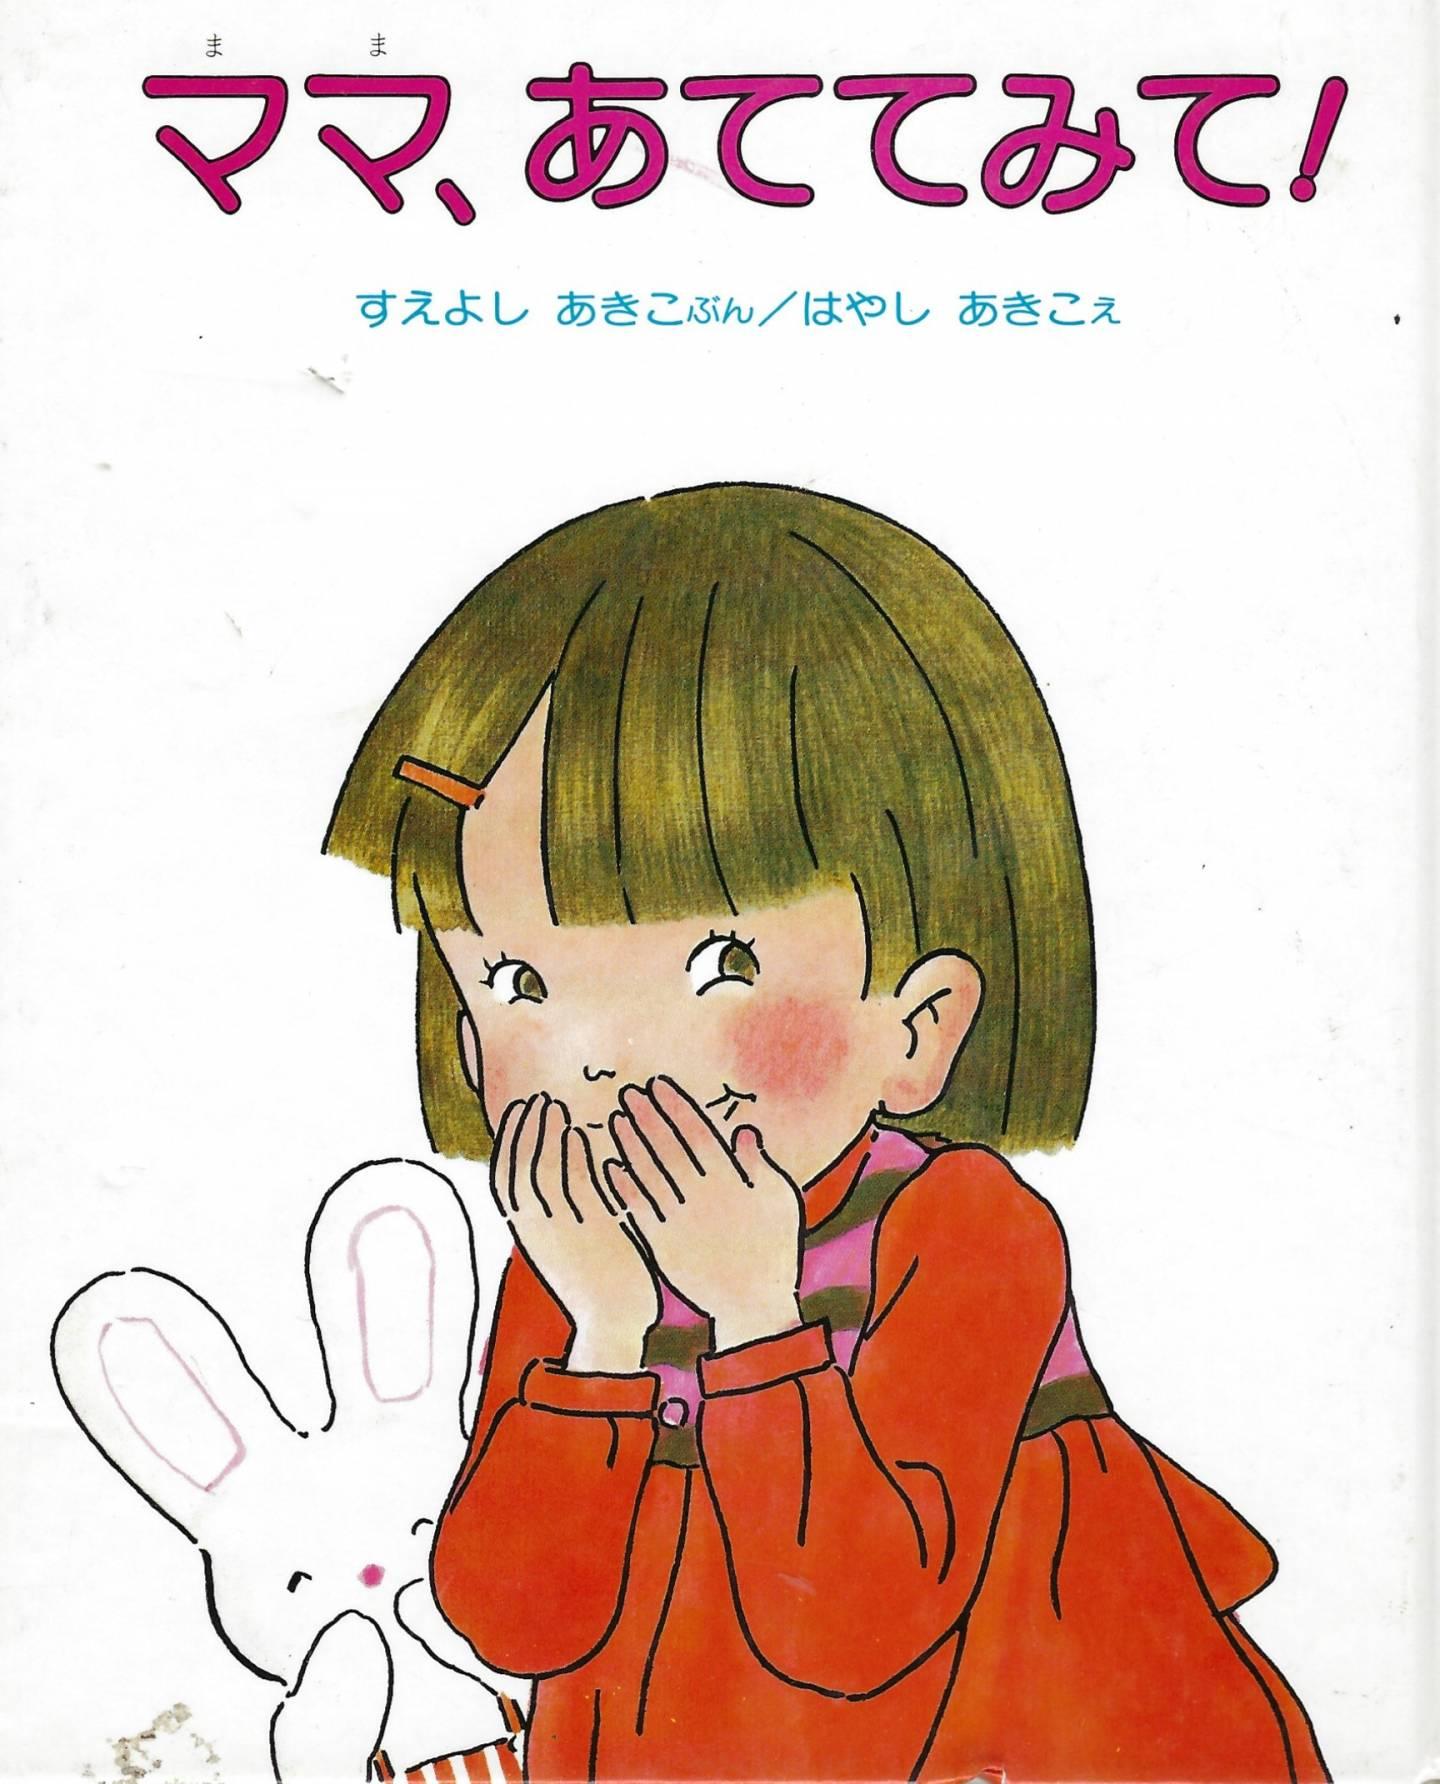 "Buchcobver vom Kinderbuch ""Mama, rate mal!"""